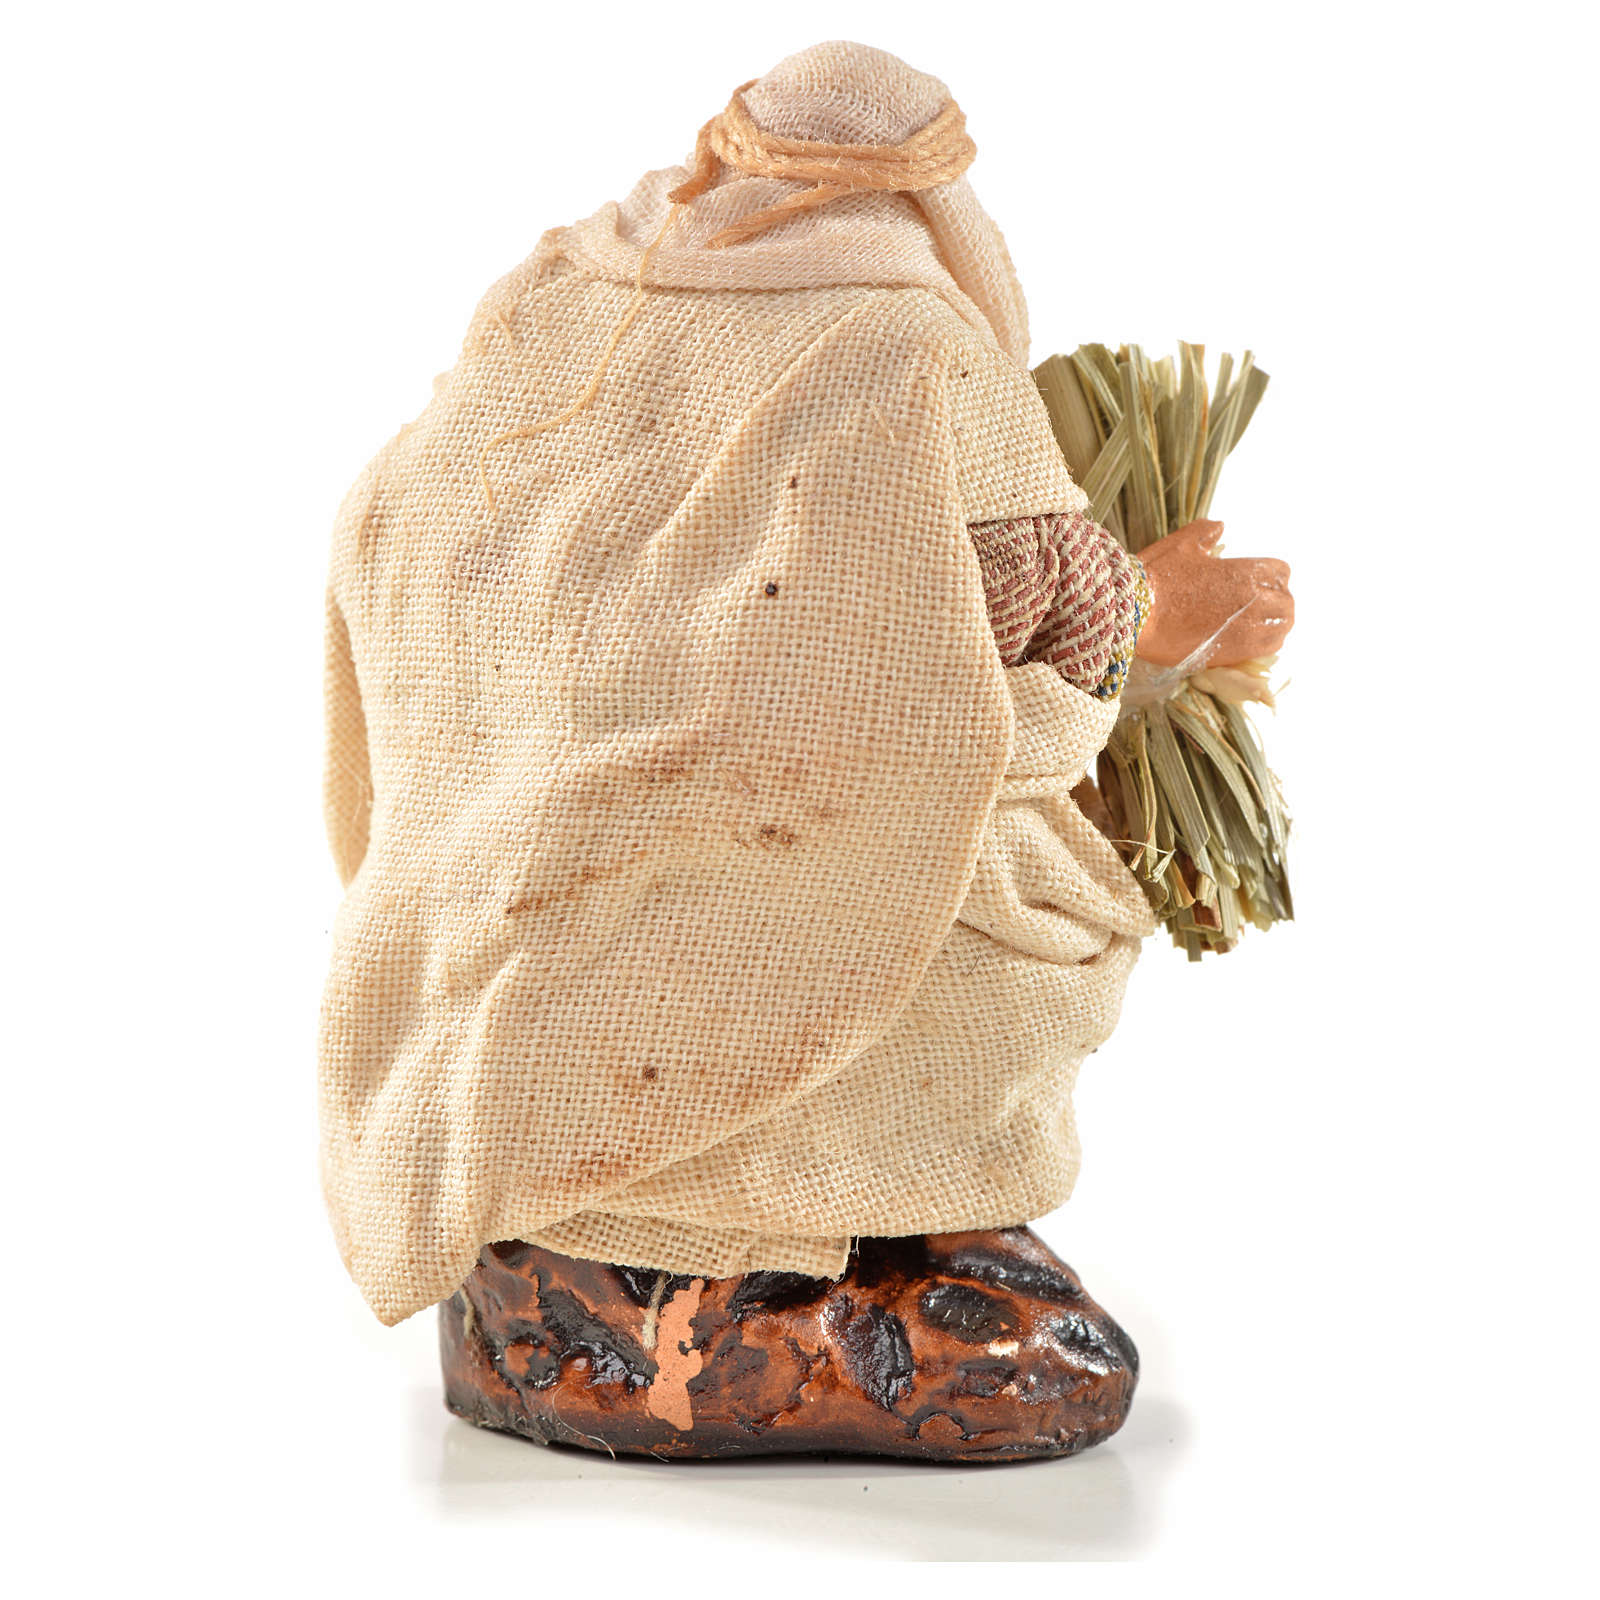 Hombre con heno 6 cm. belén Napolitano estilo árab 4